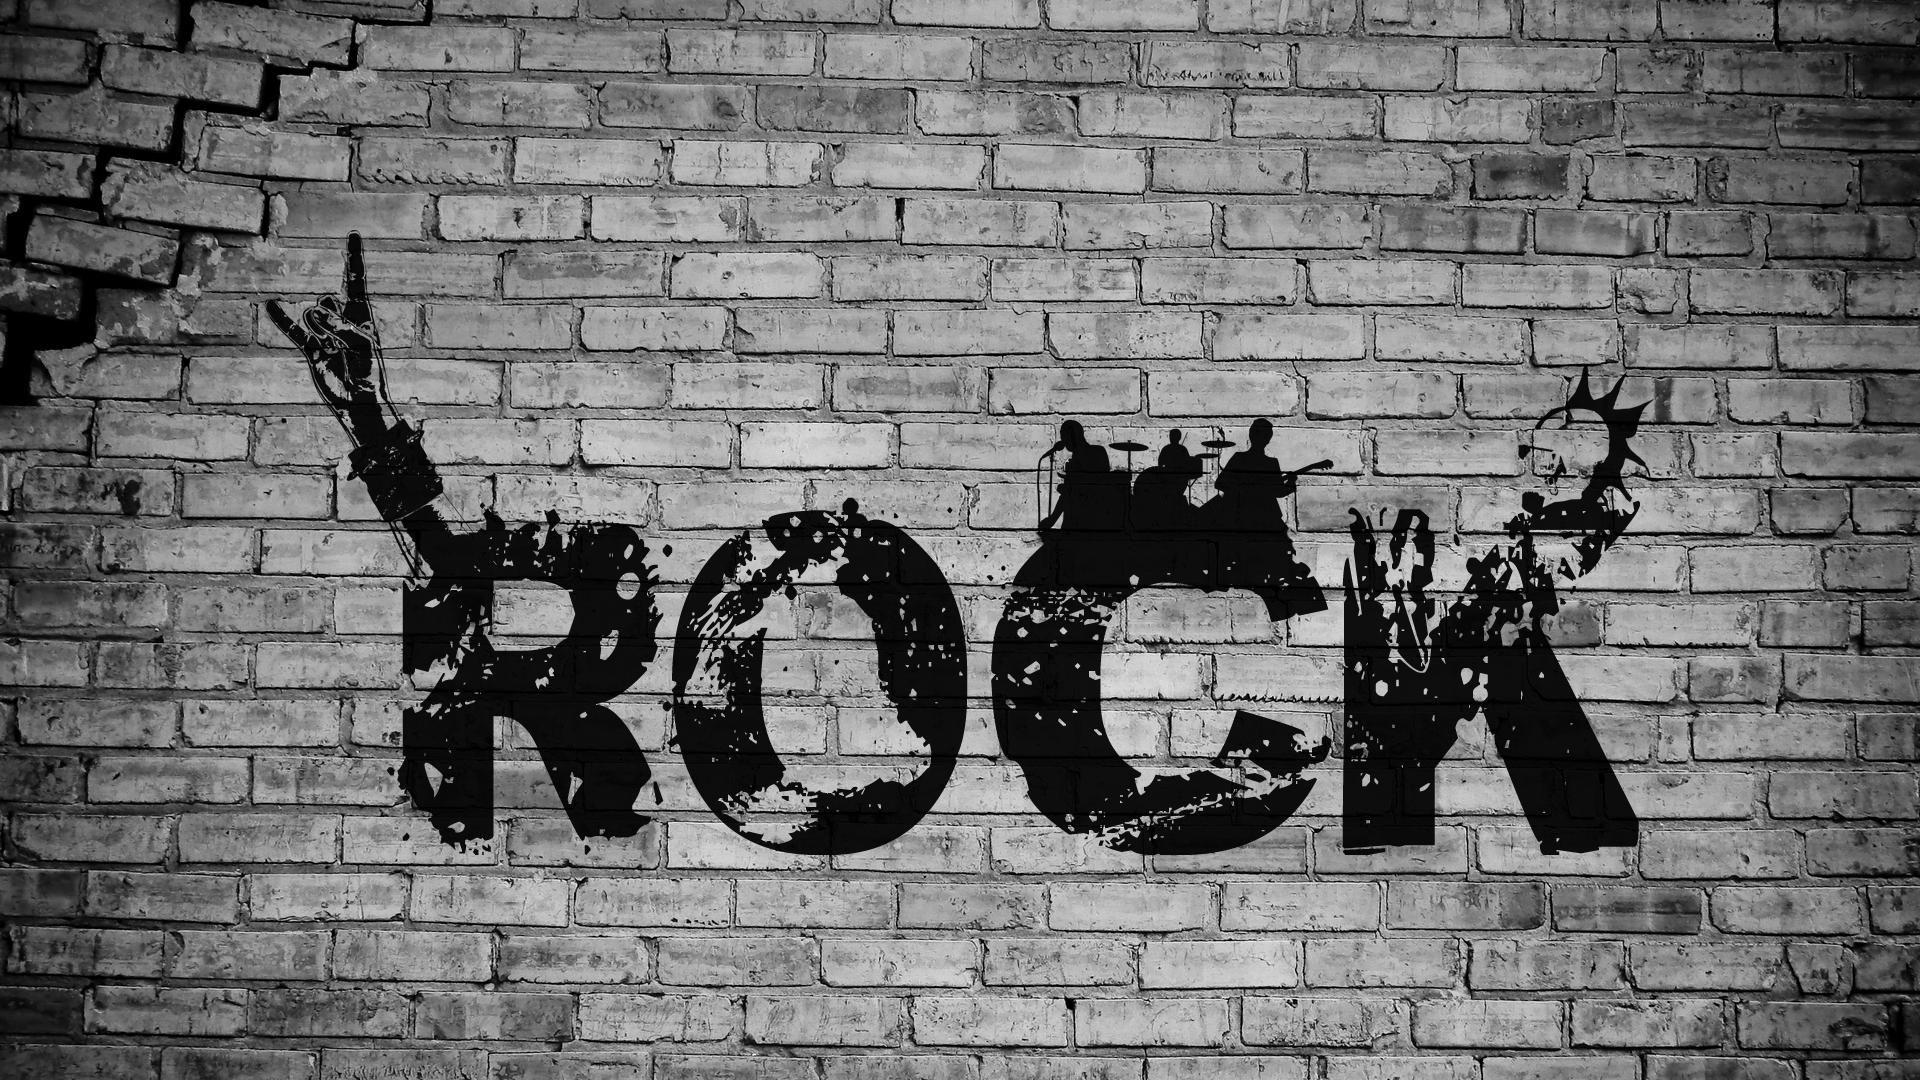 Rock Wallpaper Inspiration Pinterest -> Papel De Parede Para Sala Rock N Roll